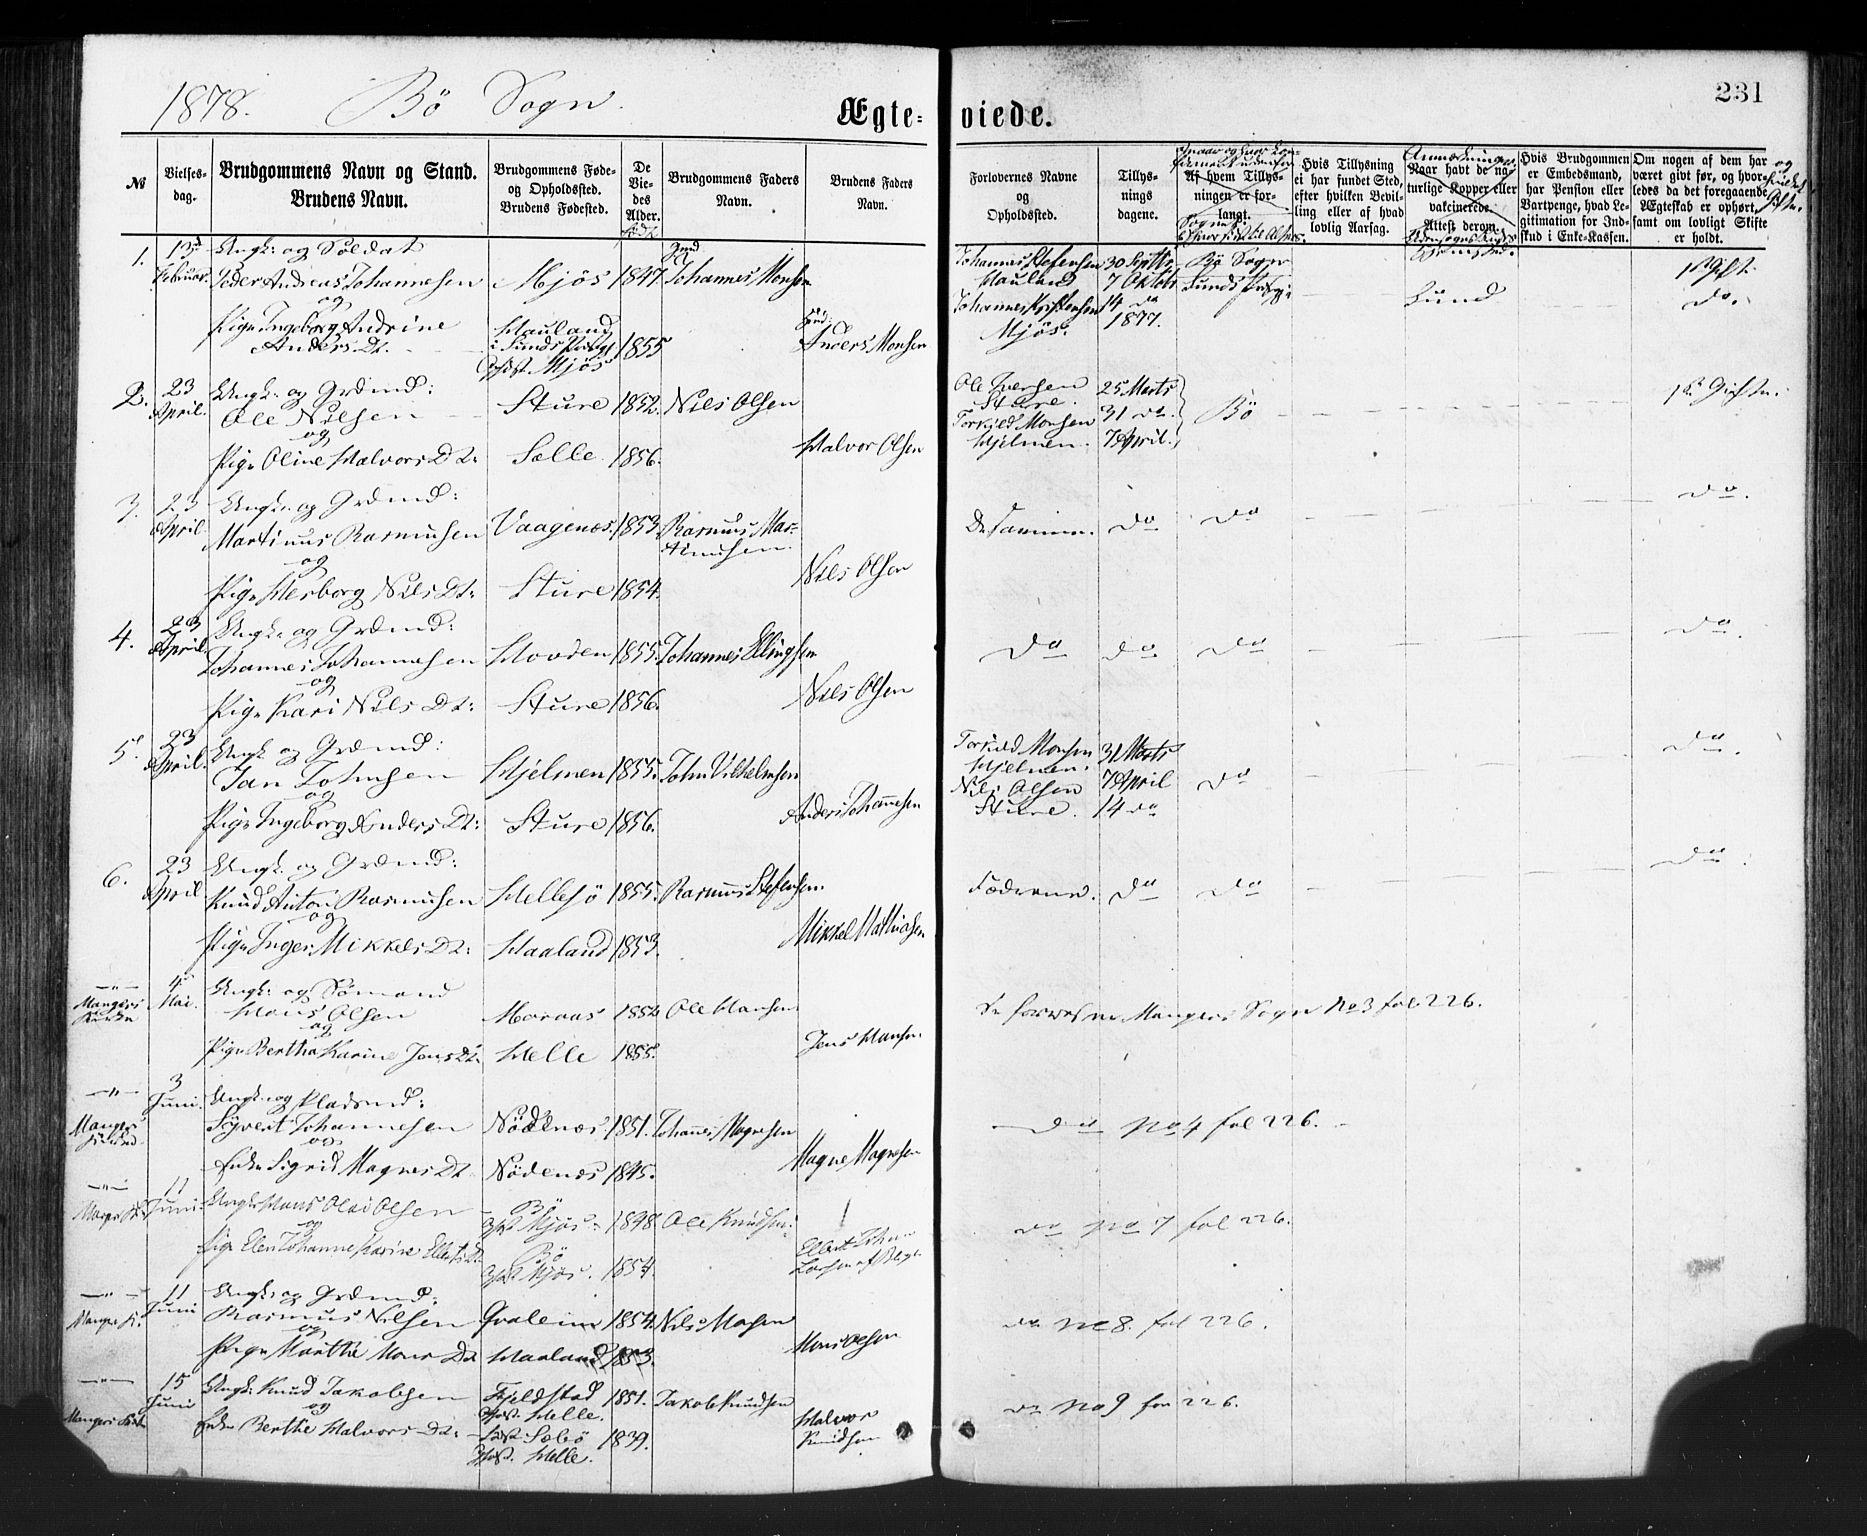 SAB, Manger sokneprestembete, H/Haa: Parish register (official) no. A 8, 1871-1880, p. 231